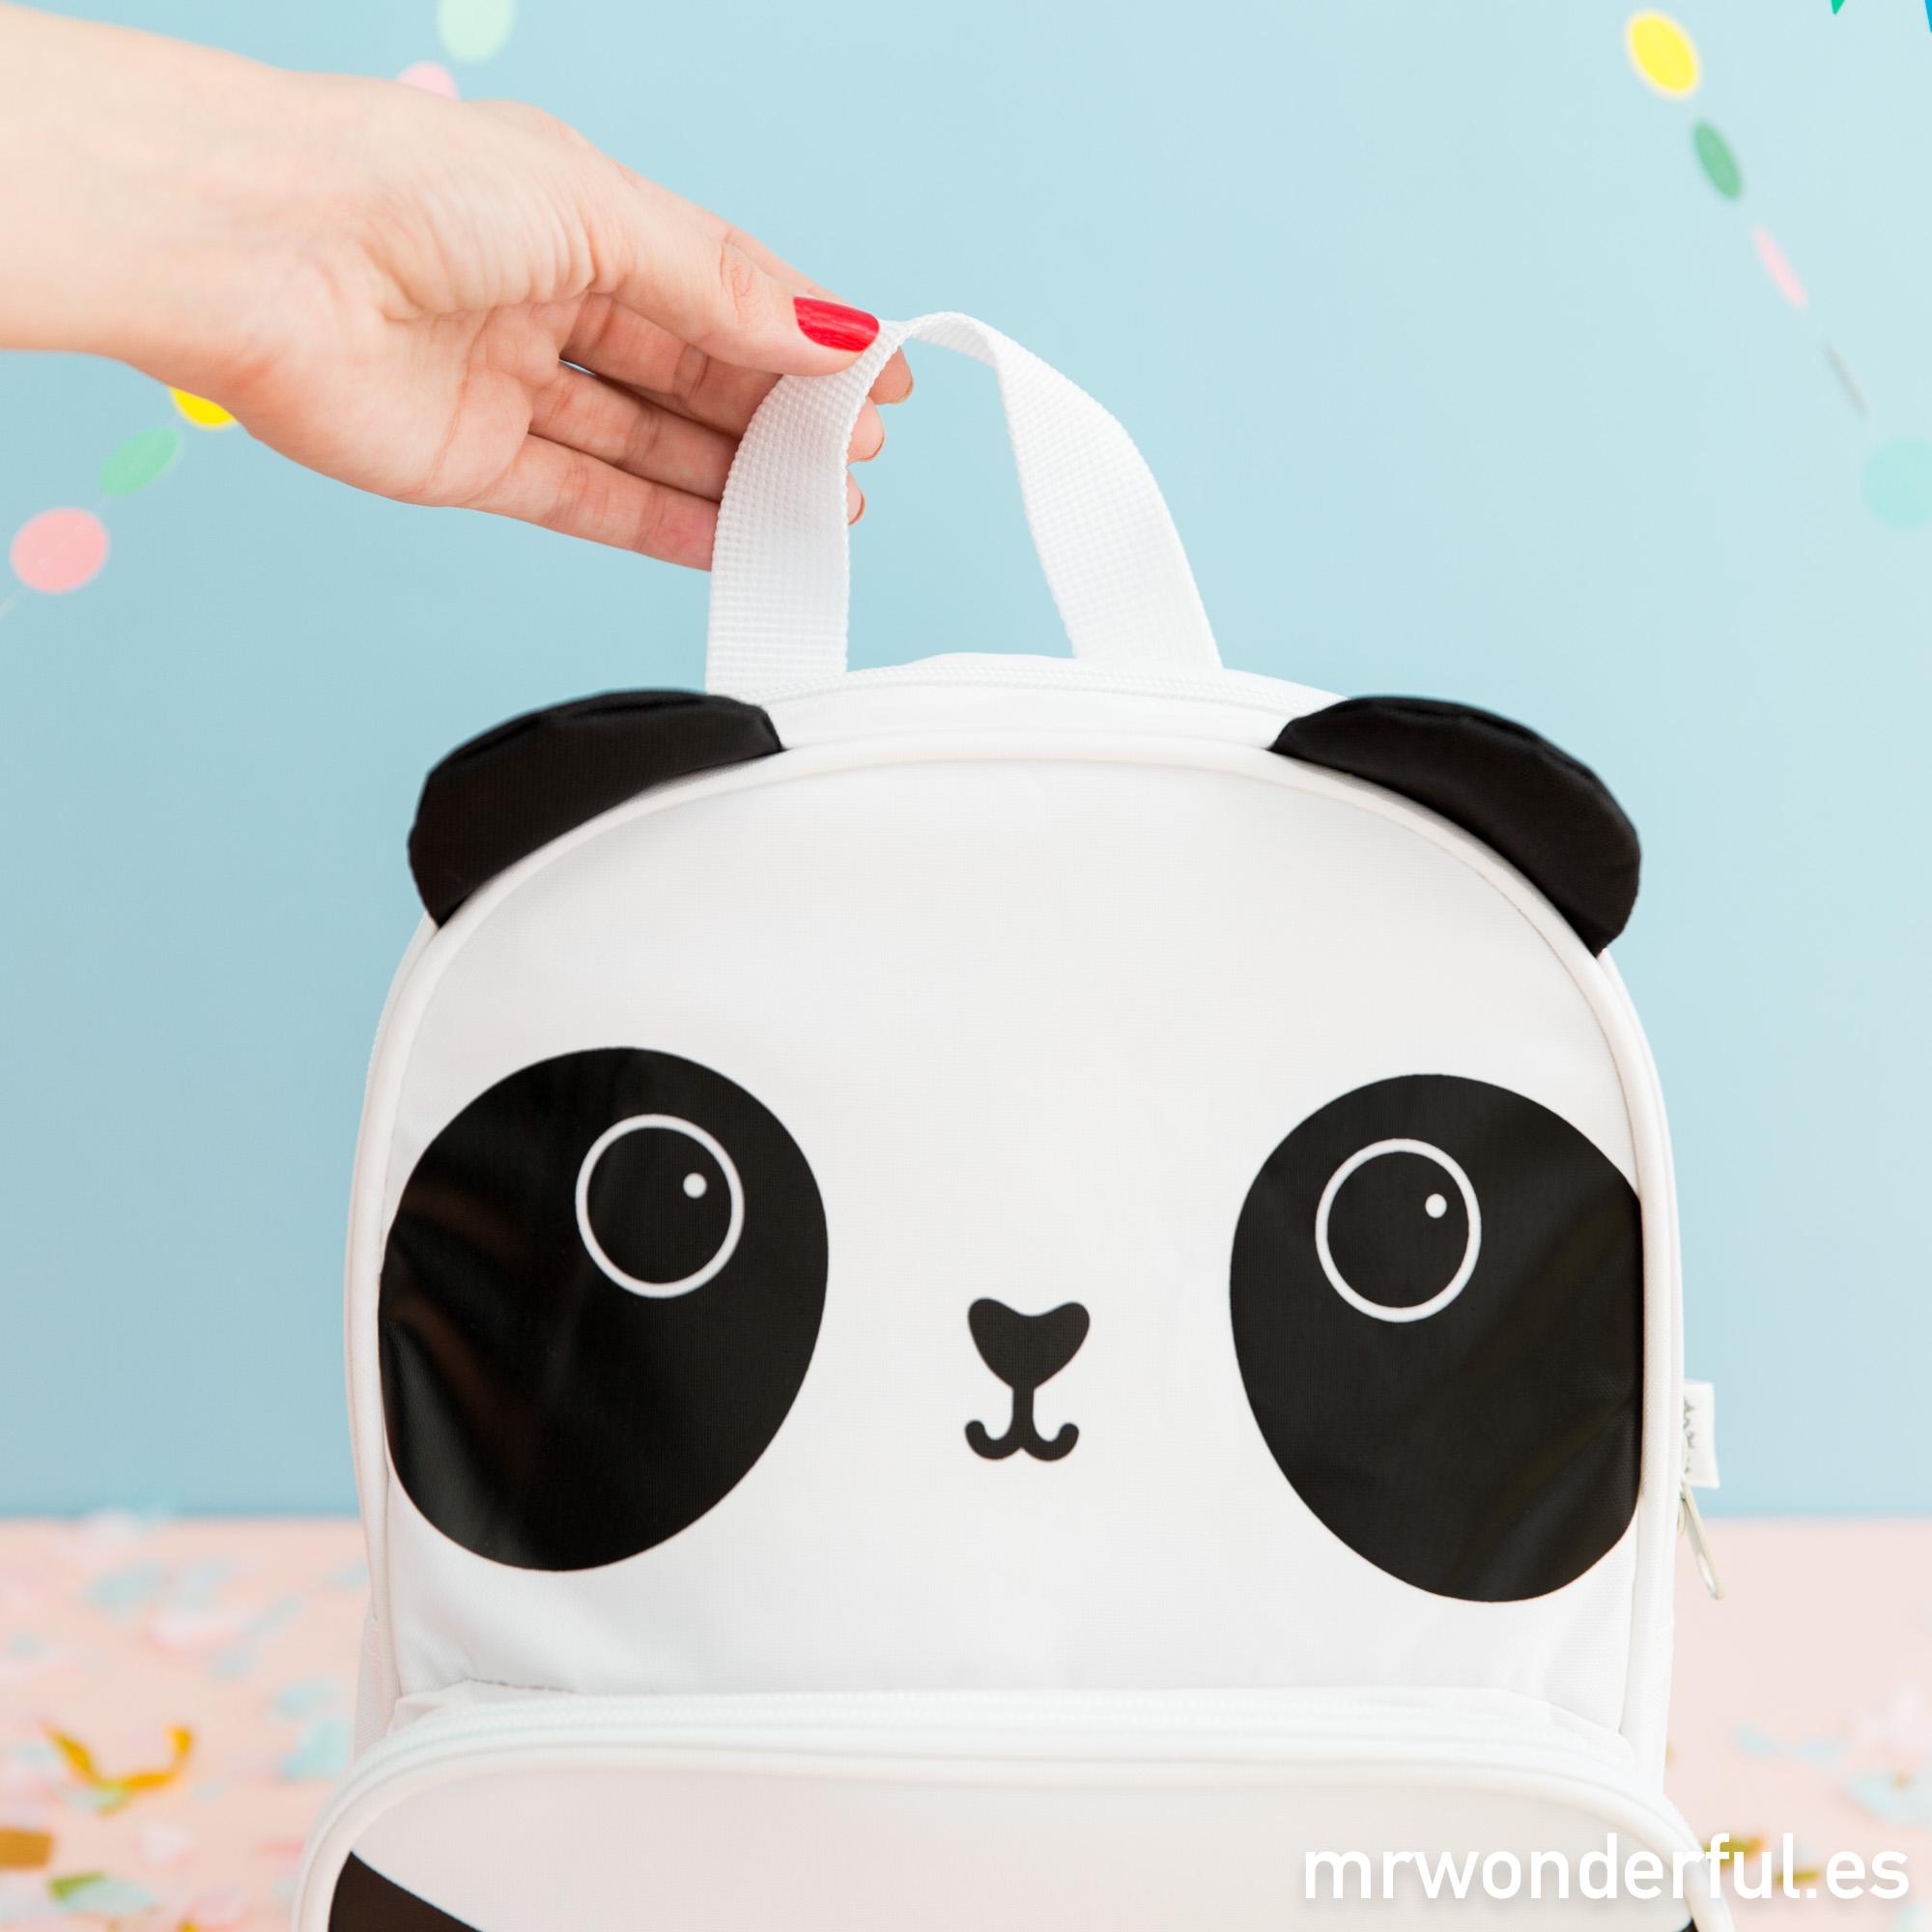 mrwonderful_pra03082un_mochila-infantil-panda-4-editar